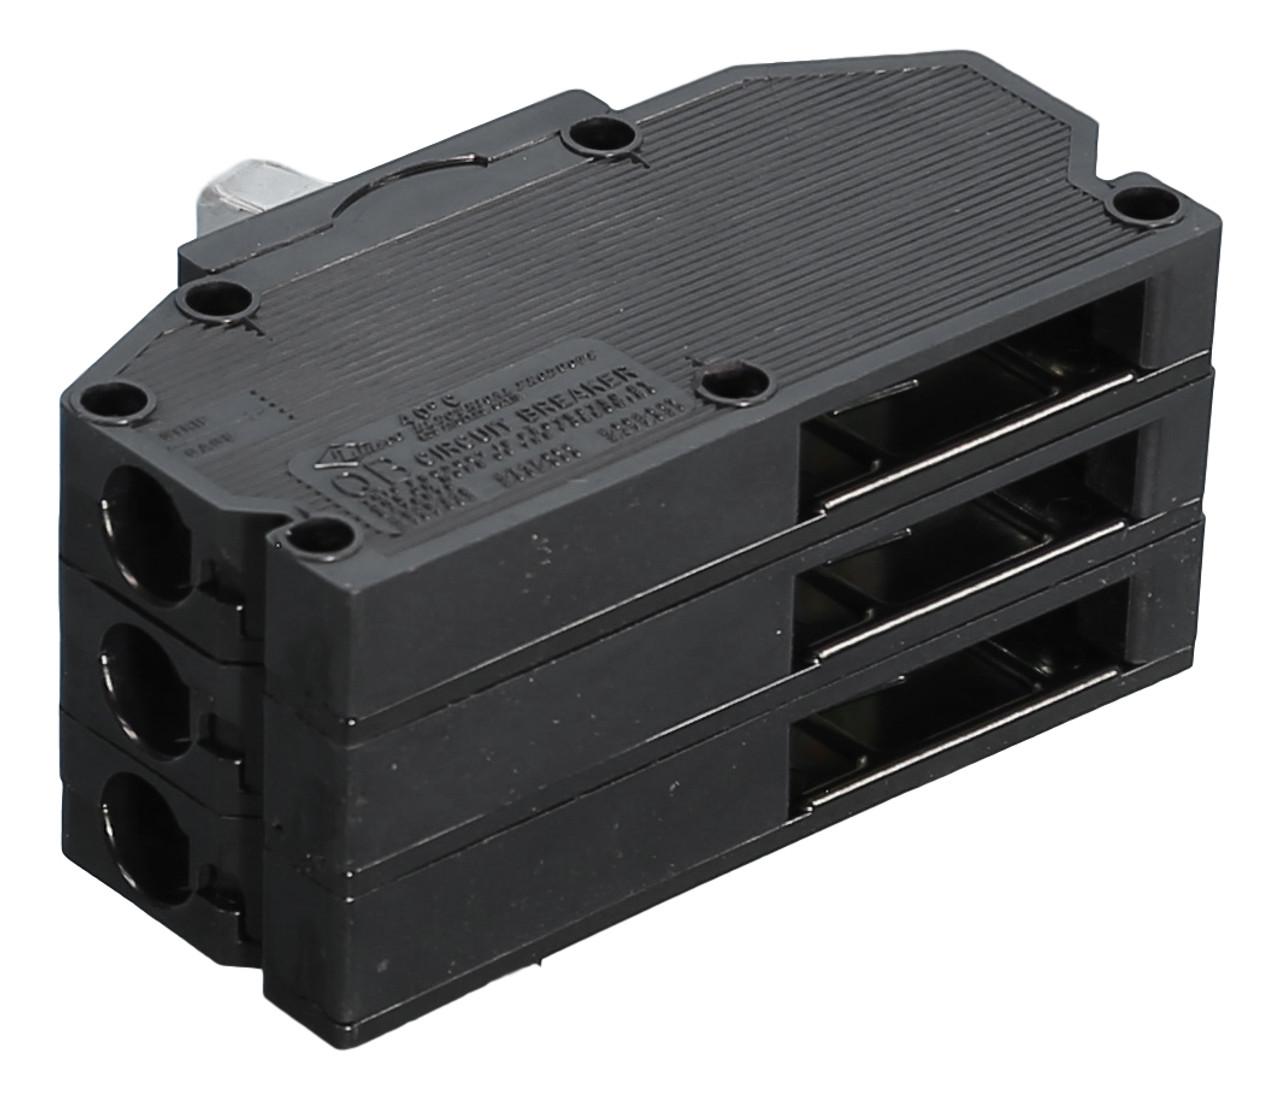 QB243020 Zinsco Bolt-On Breaker example